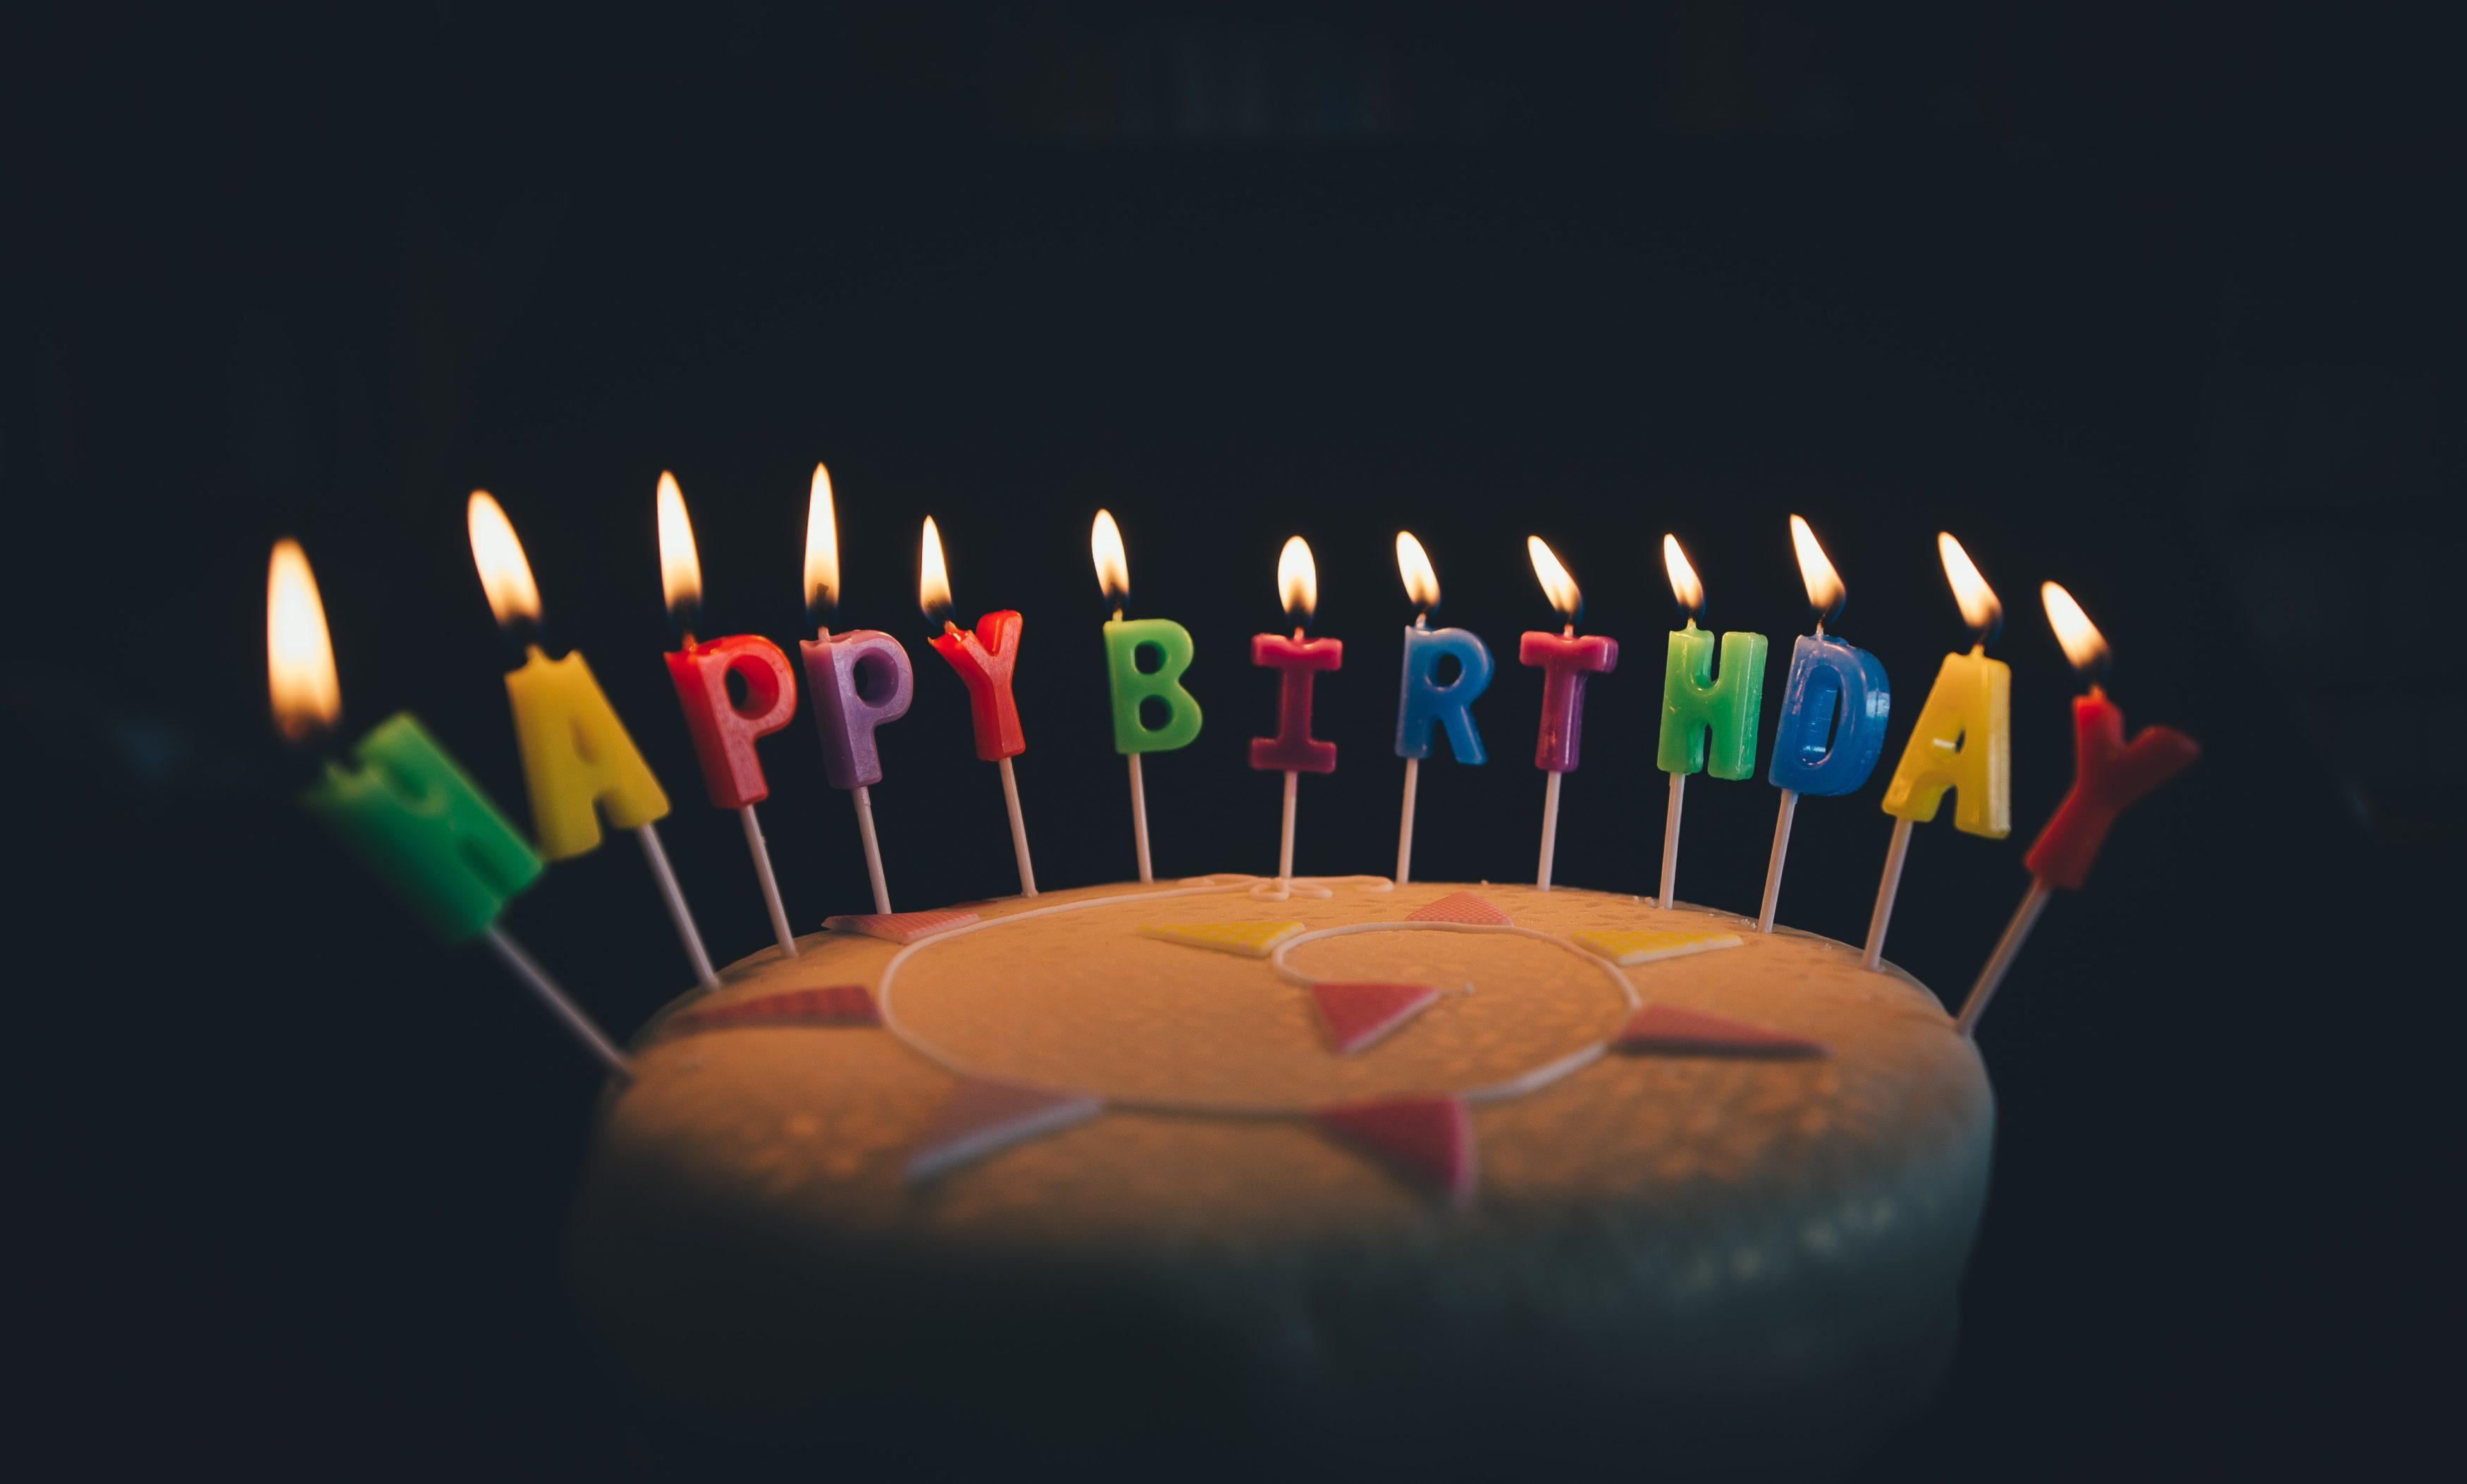 Happy Birthday Led Zeppelin Ii The Signal